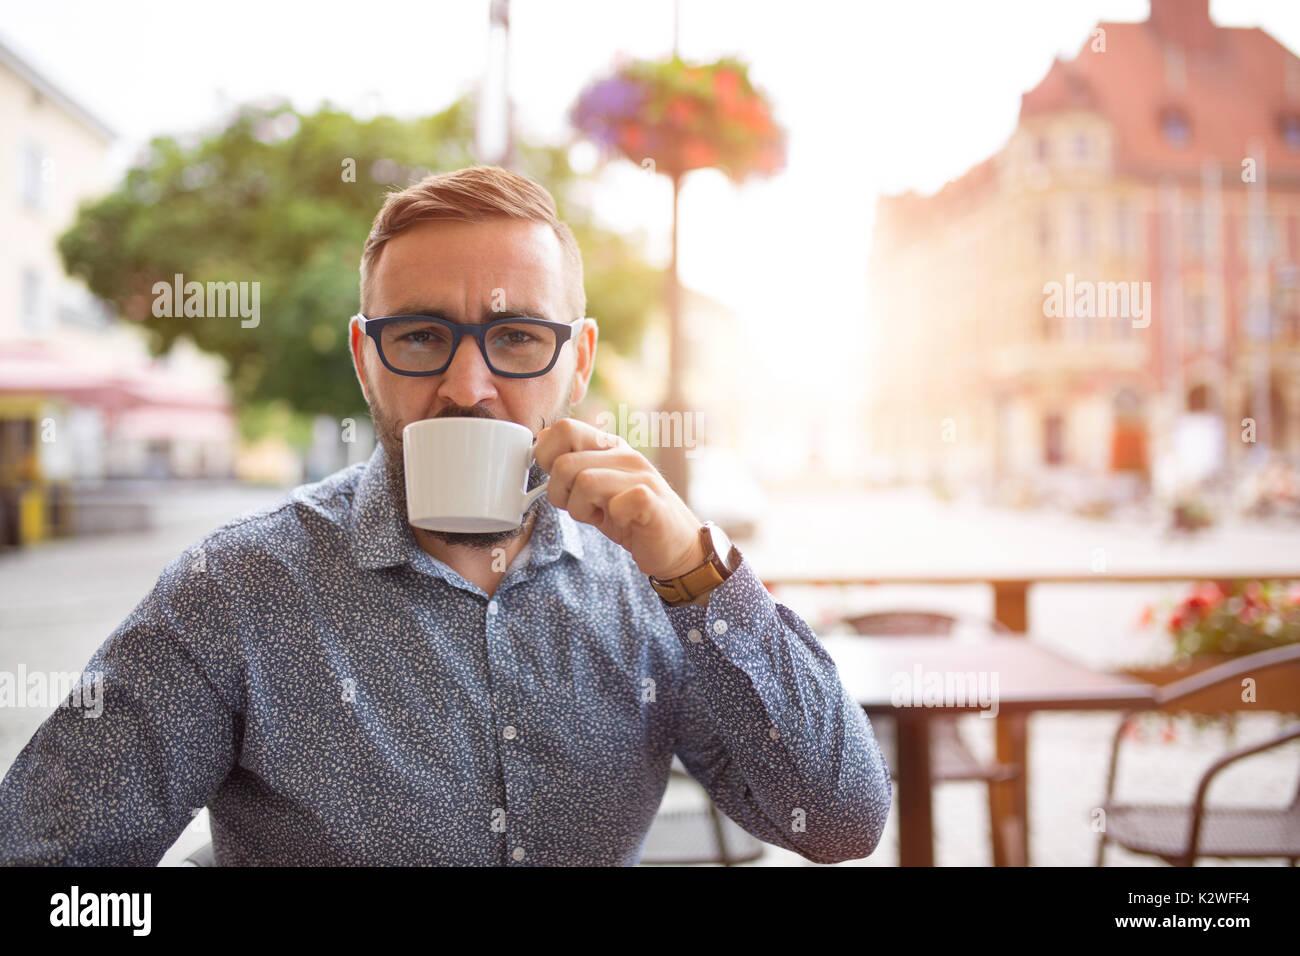 Eleganten Mann trinken Cappuccino im Cafe - Garten in der Altstadt Stockbild